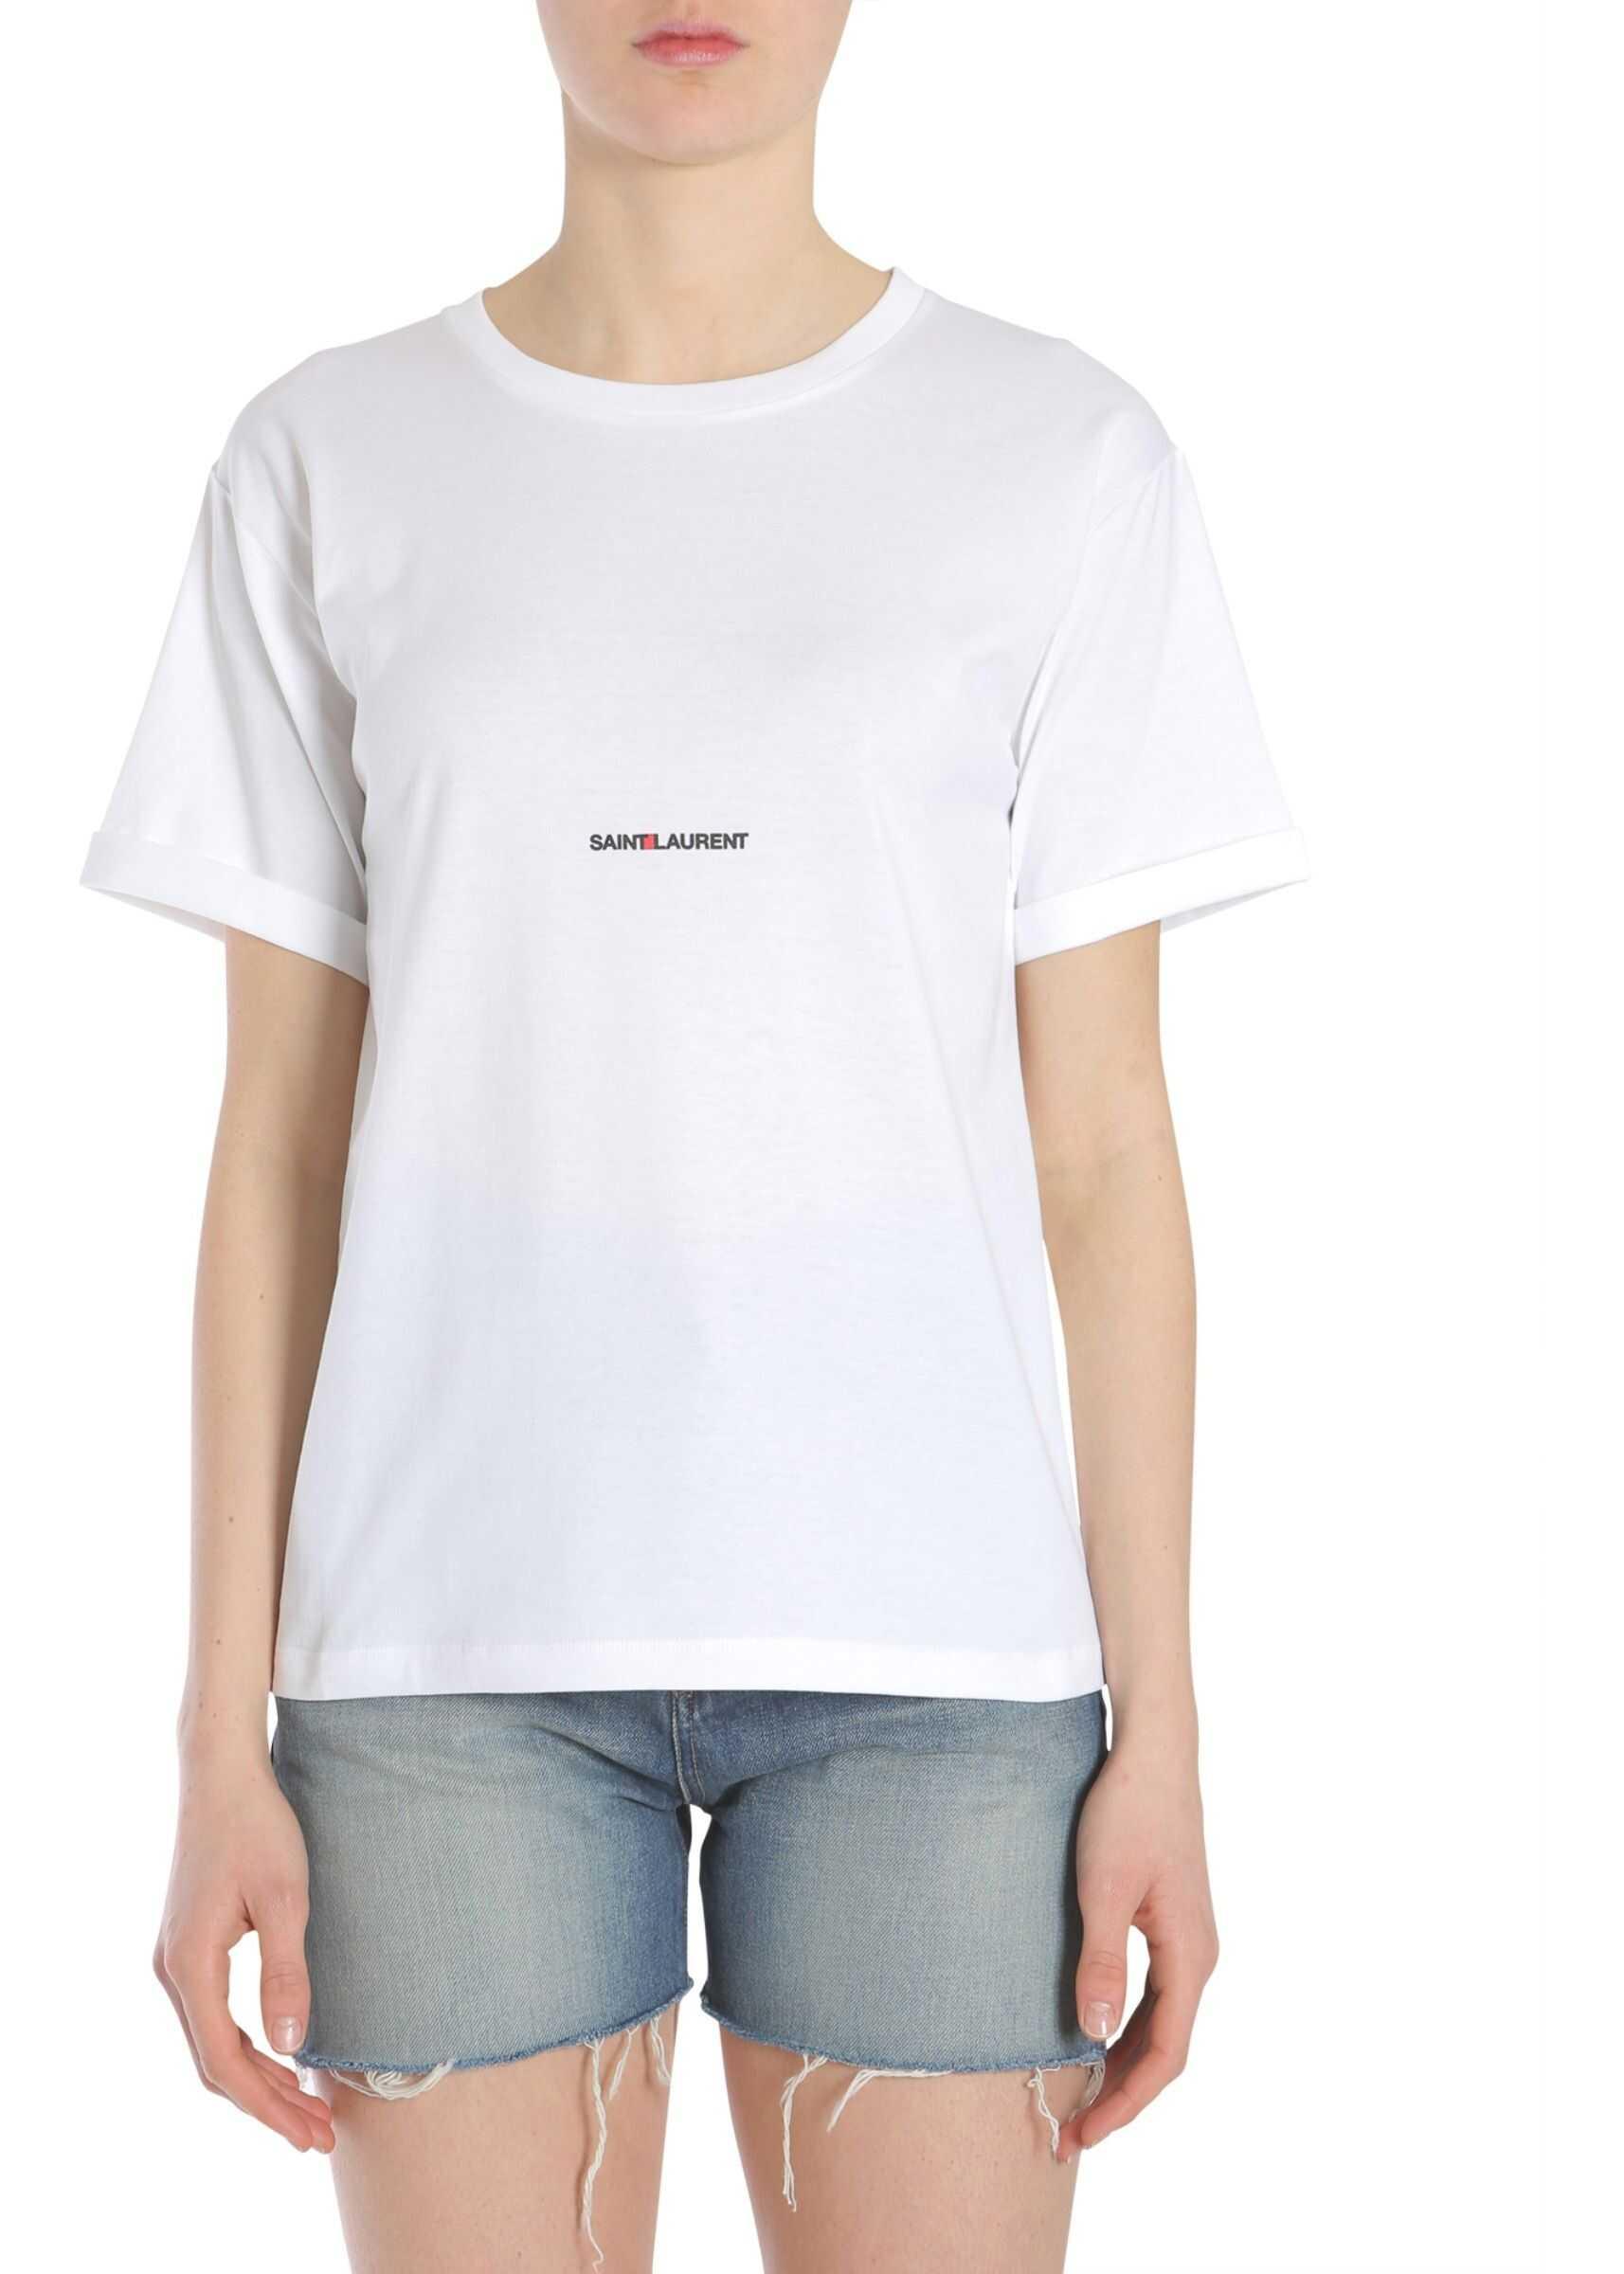 Saint Laurent Round Neck T-Shirt WHITE